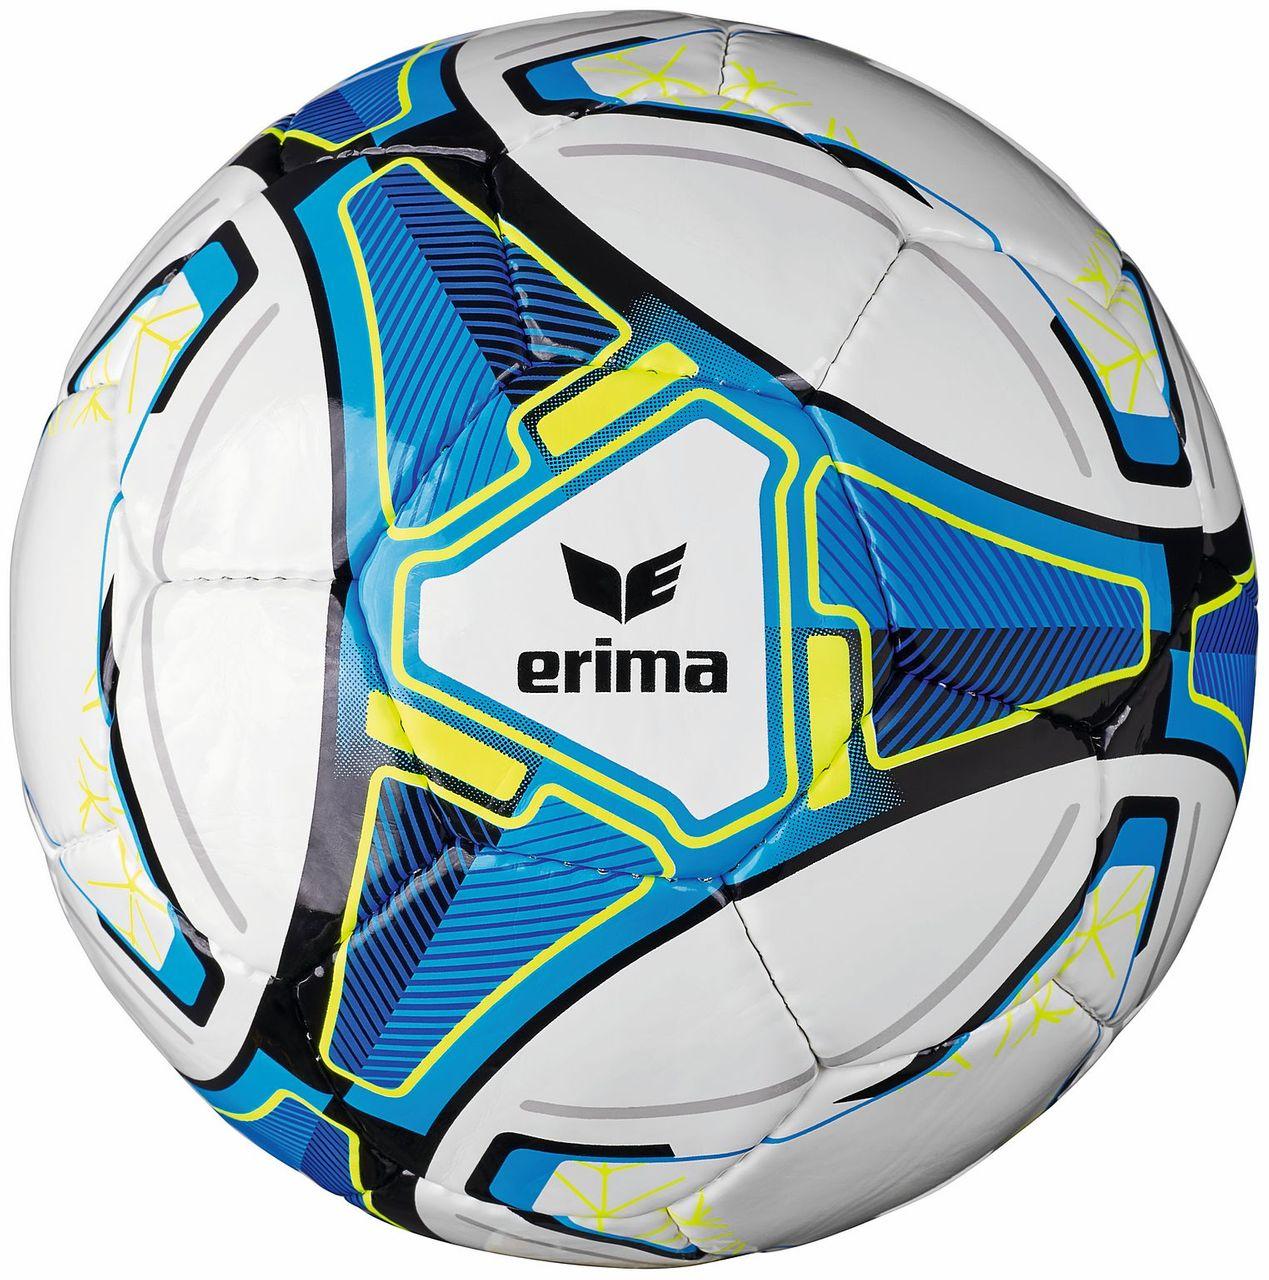 10 x Erima Trainingsball Allround Training inkl. Ballsack